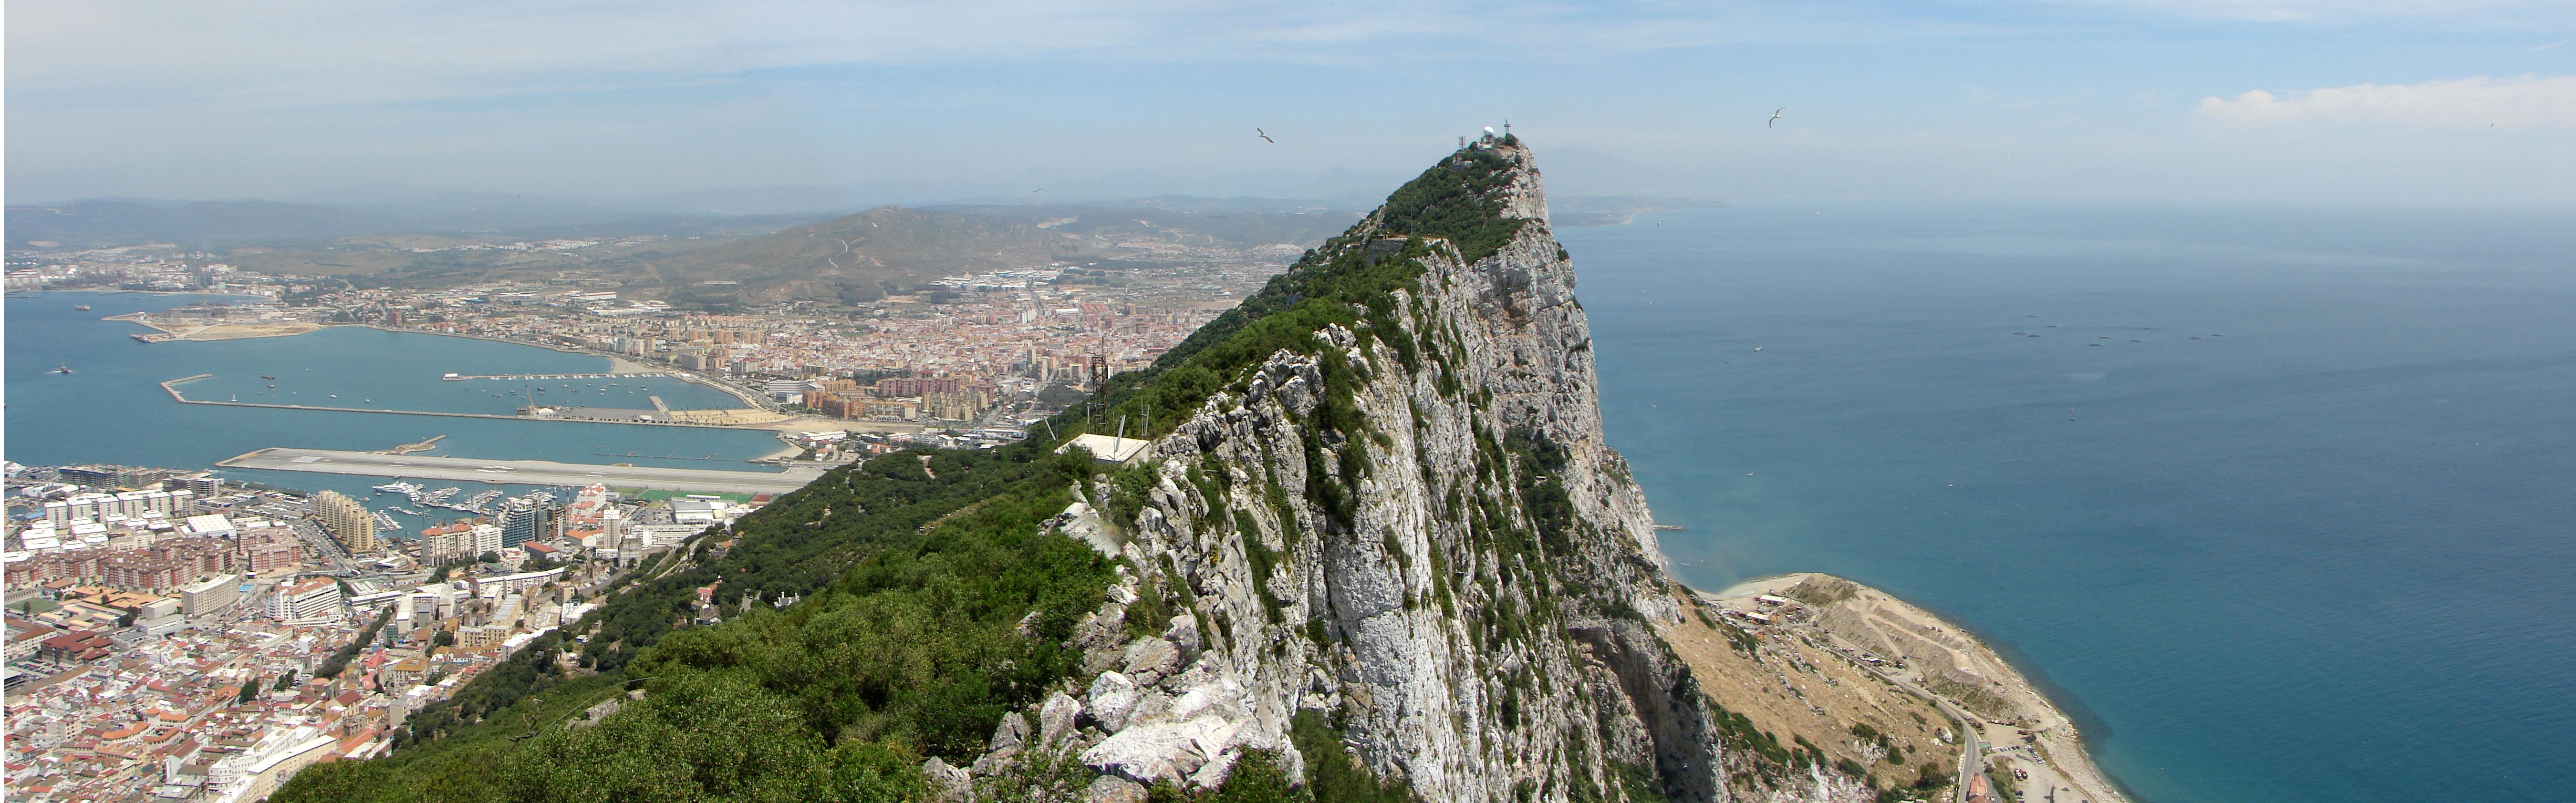 Top_of_the_Rock_of_Gibraltar.jpg